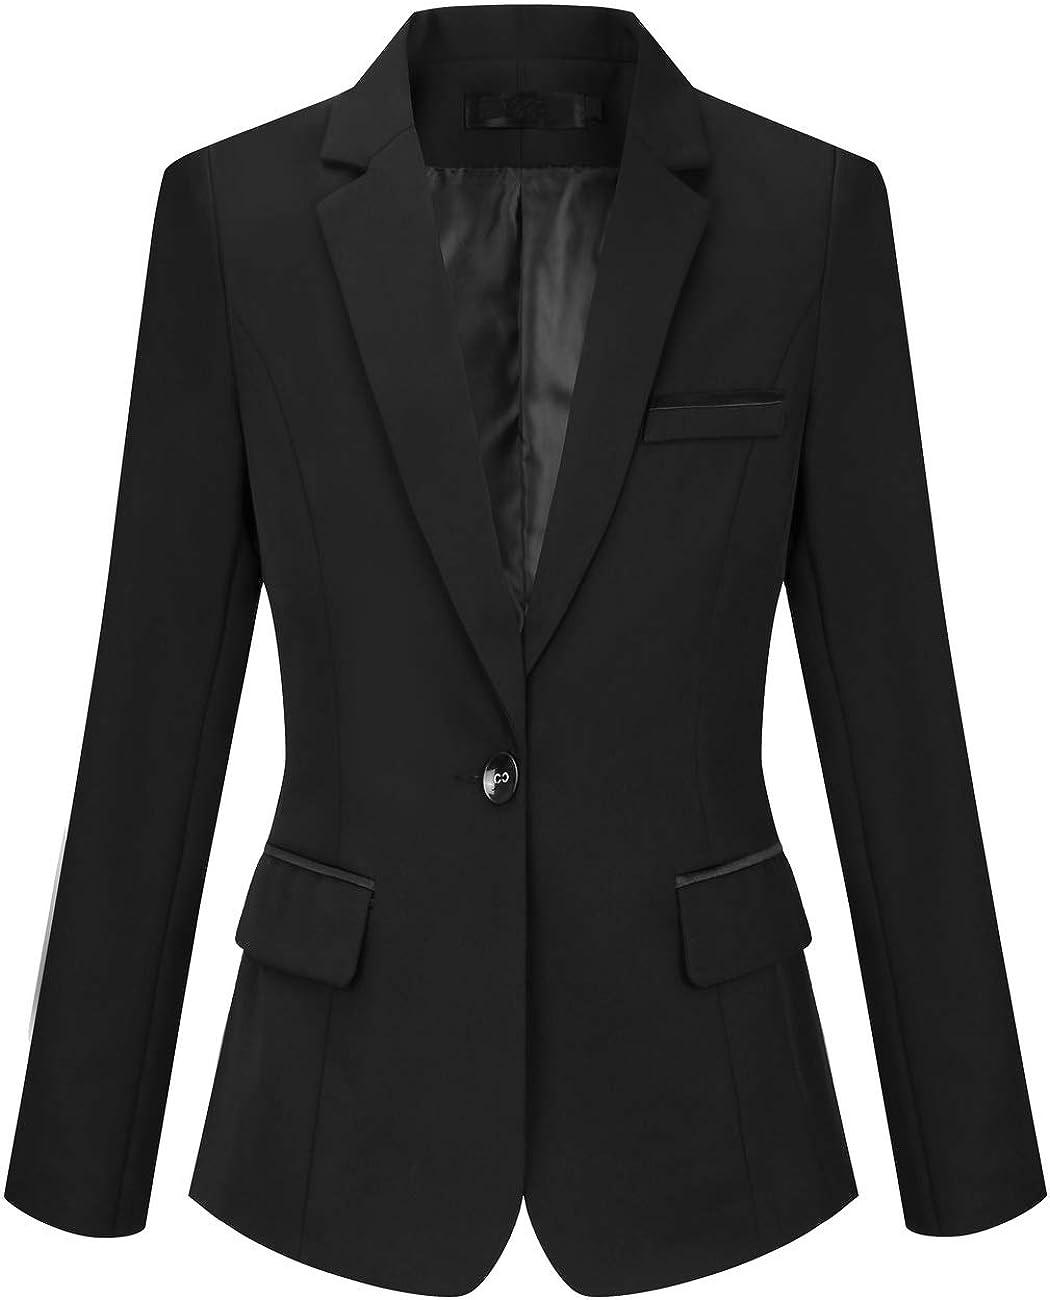 Amazon.com: Foucome Blazer - Conjunto de trajes para mujer ...